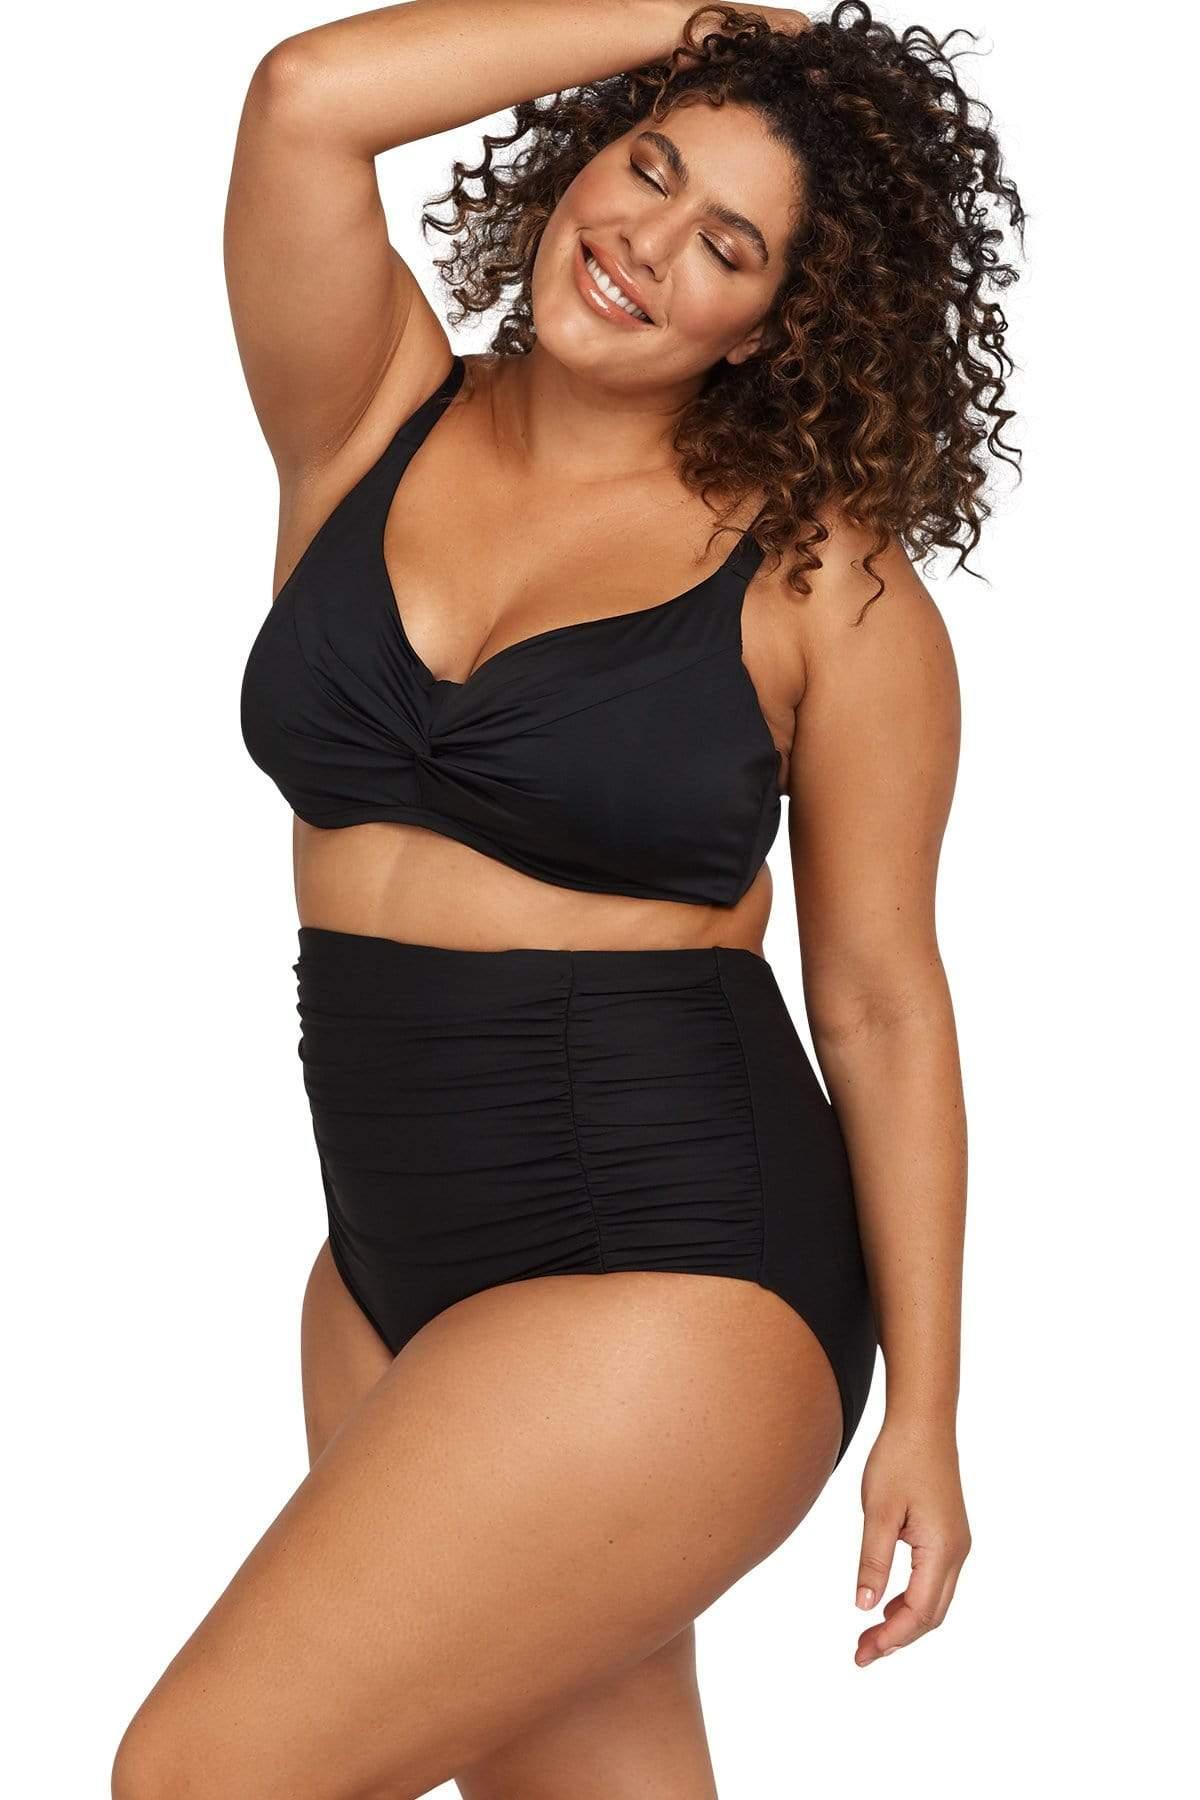 Hues Monet Soft Cup Underwire Bikini Top